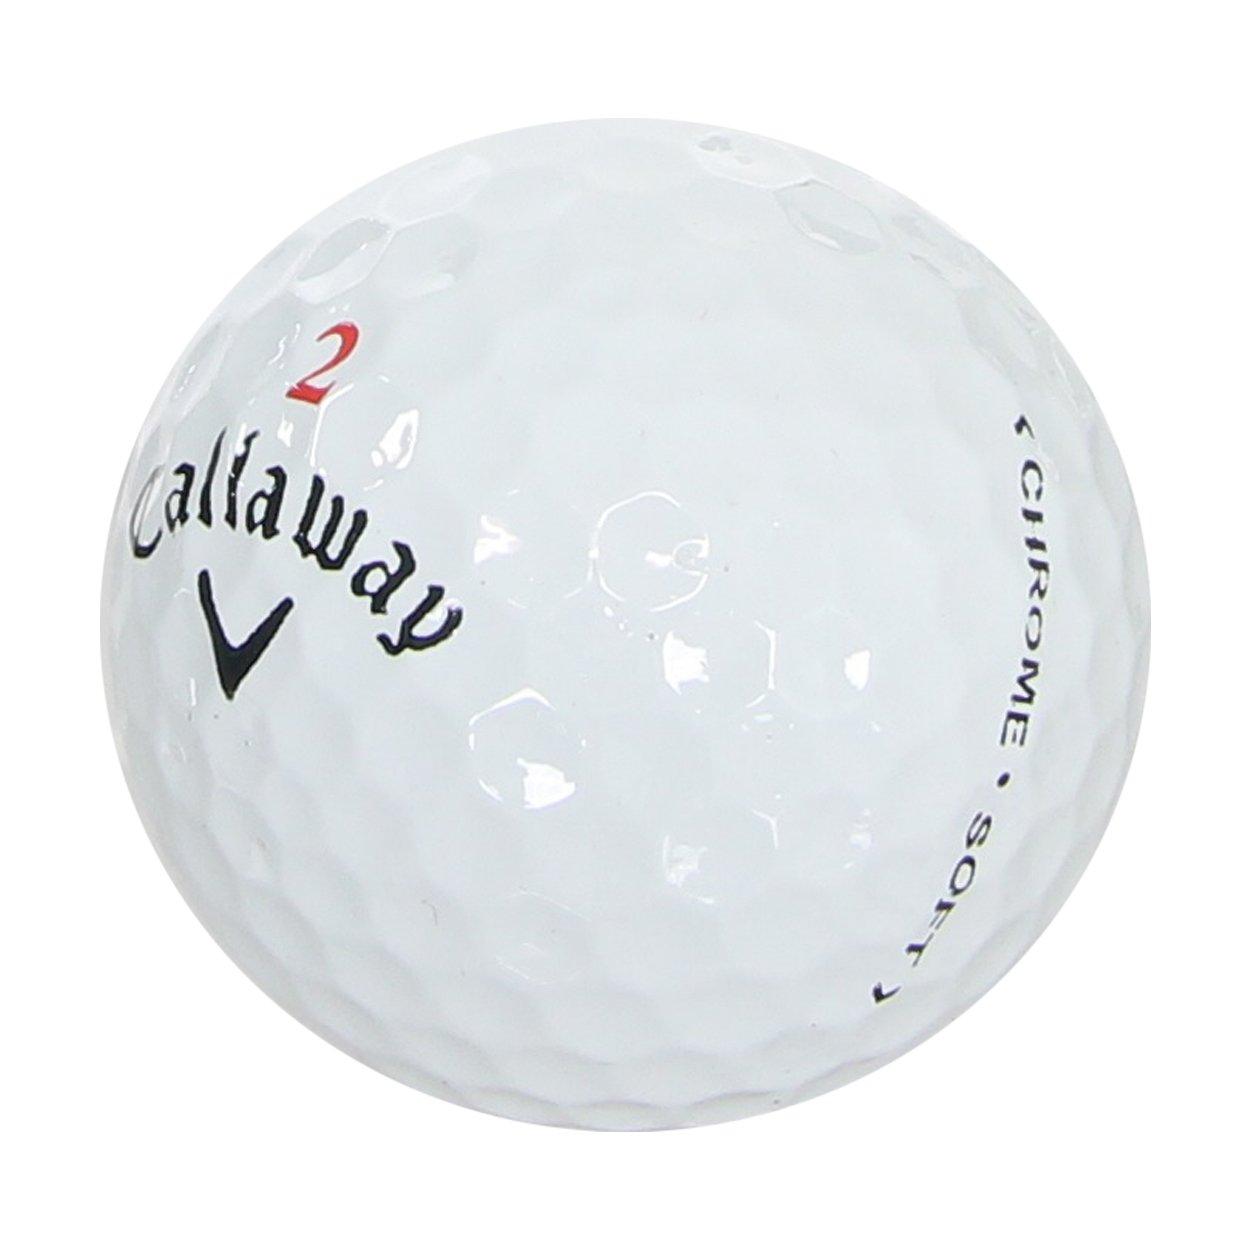 Callaway Chrome Soft Golf Balls 3-Dozen (36), Refinished/Mint Condition